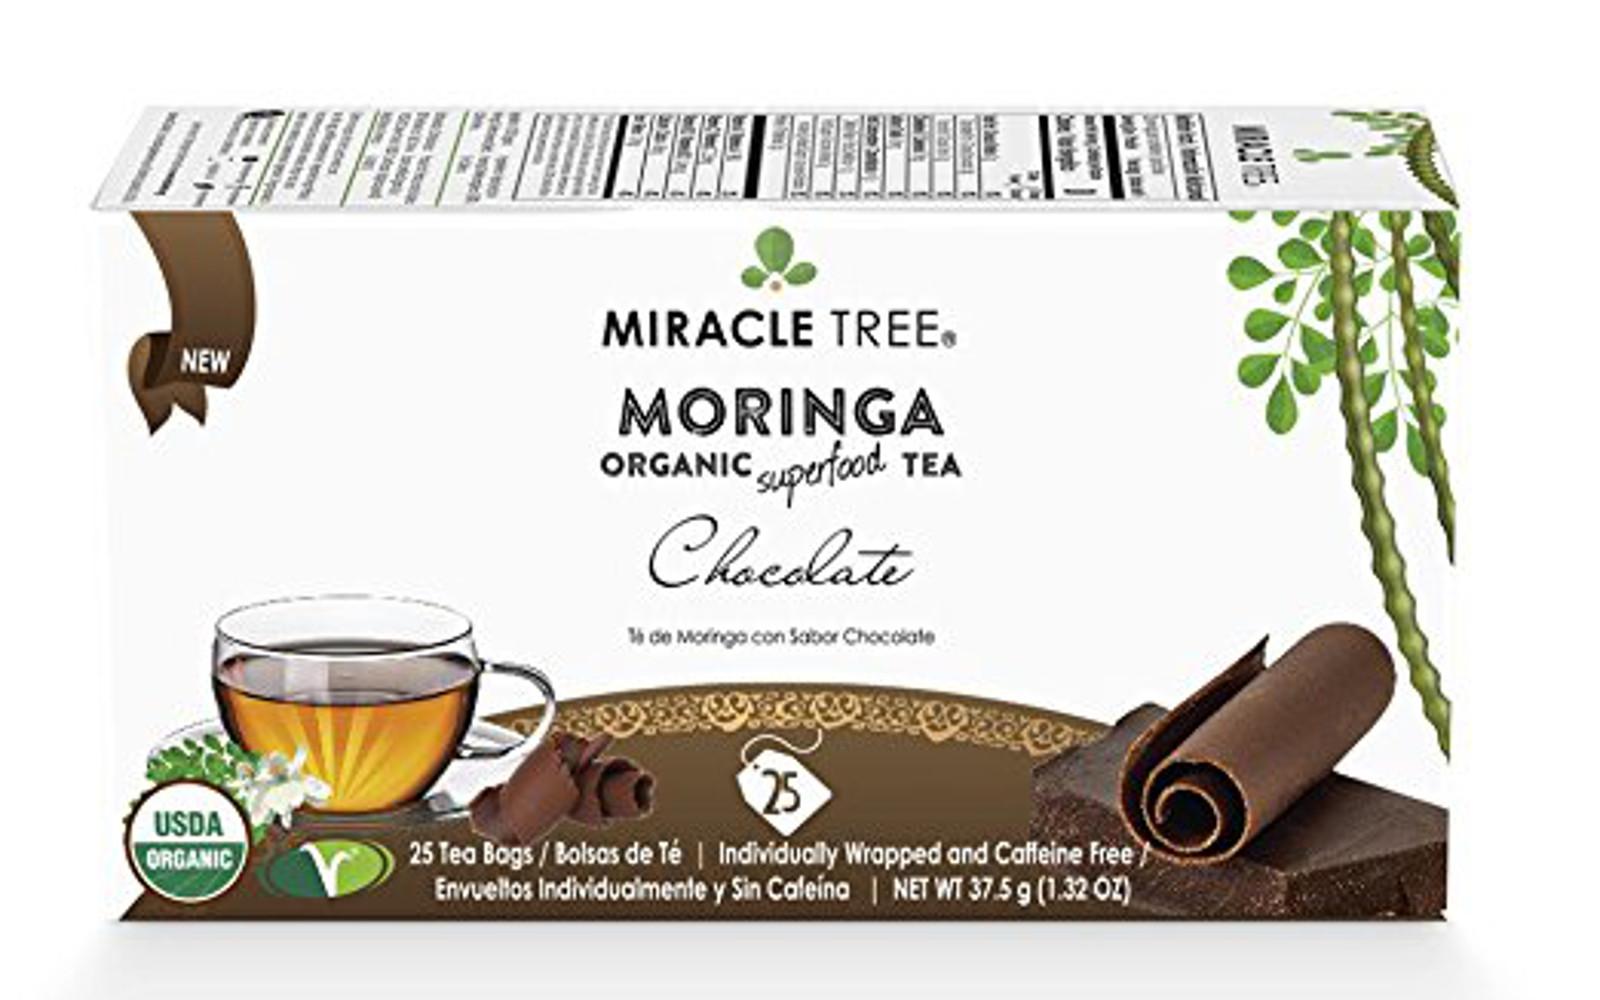 Miracle Tree - Organic Moringa Superfood Tea, 25 Individually Sealed Tea Bags, Chocolate